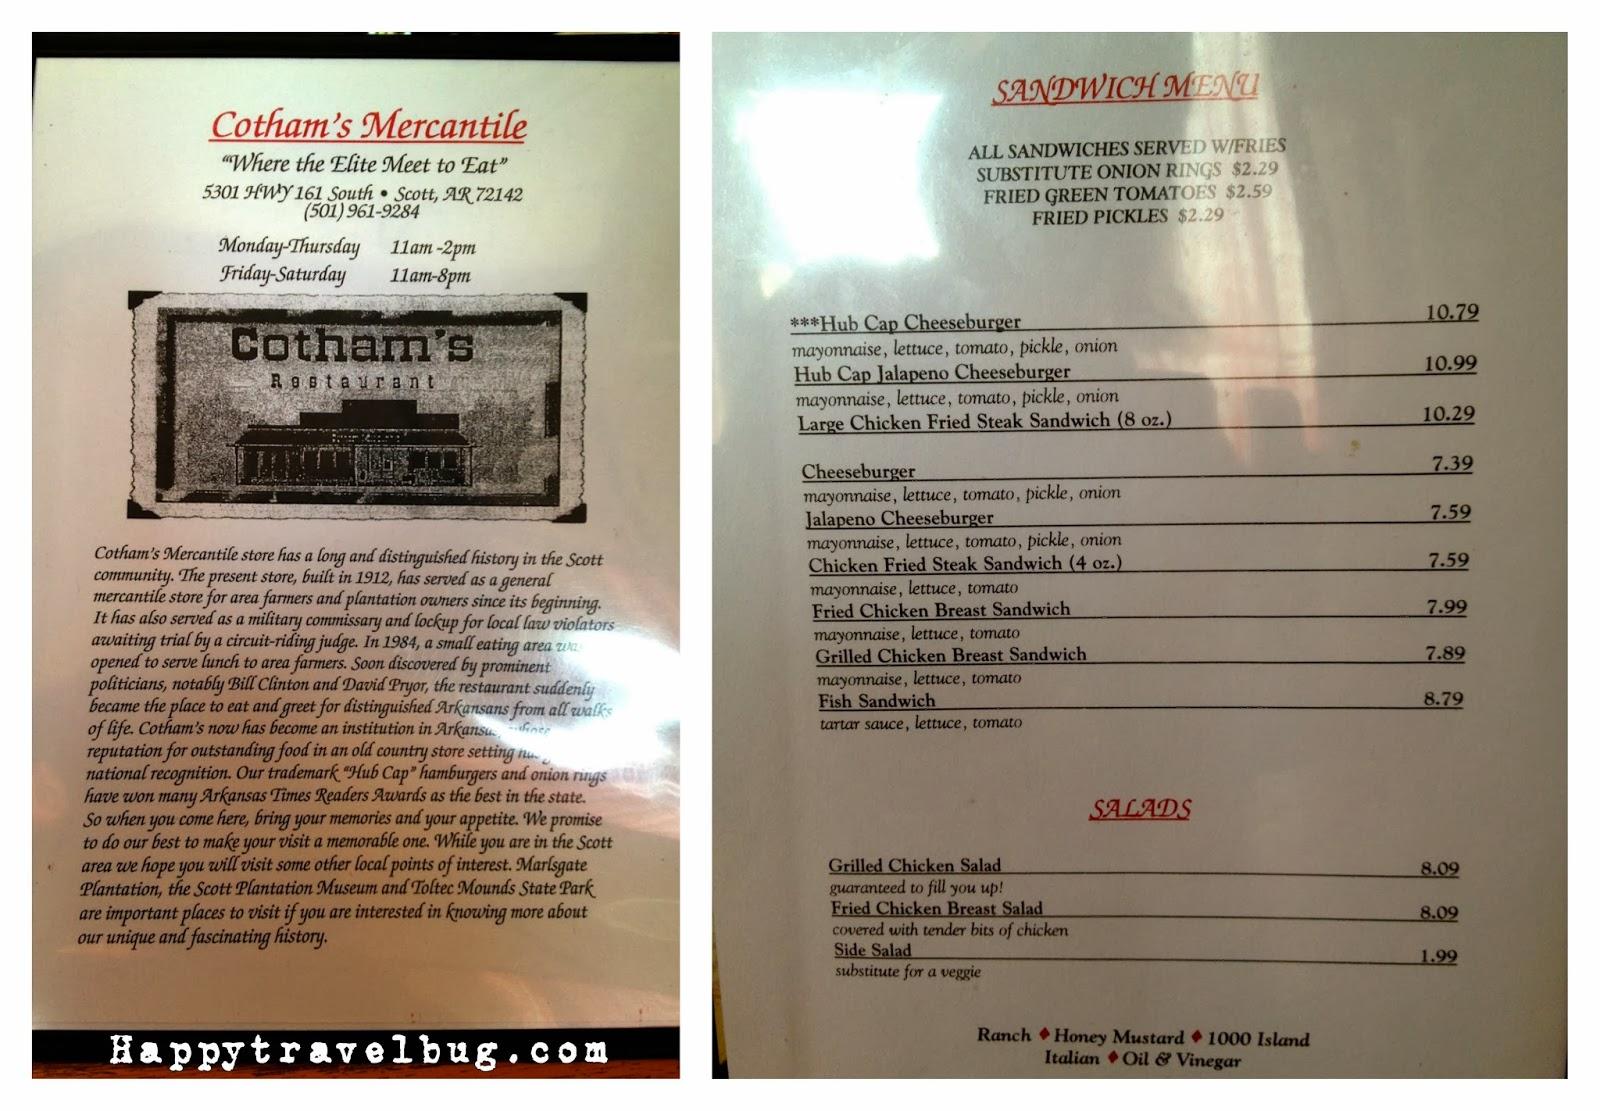 Cotham's Mercantile menu